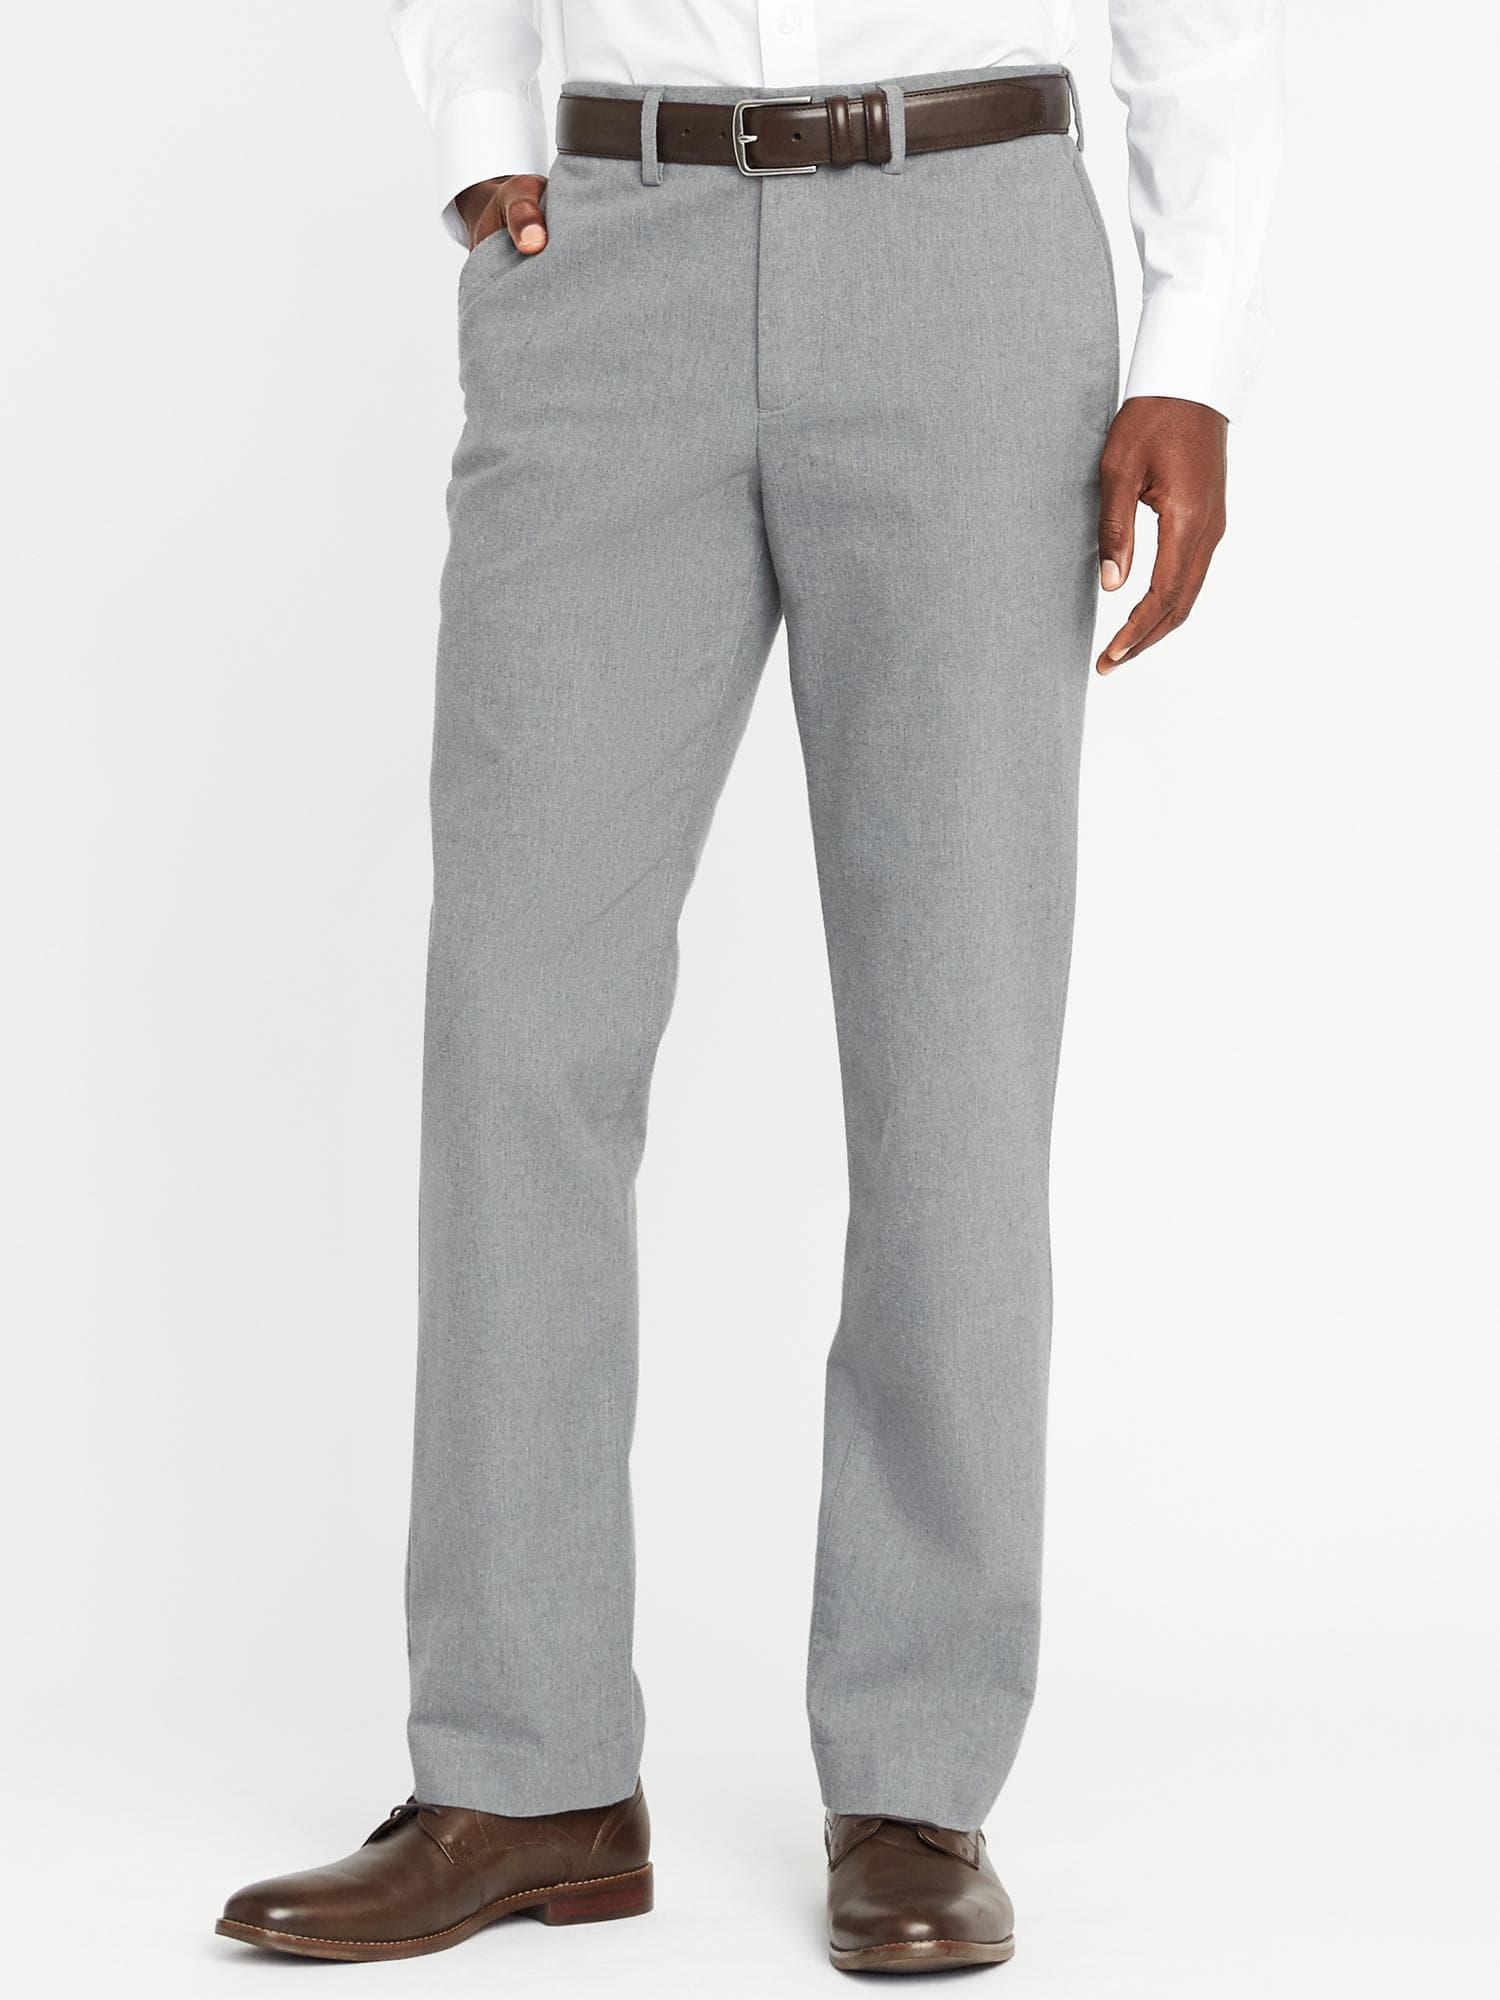 474add90e38 Gray Dress Pants Old Navy - Data Dynamic AG